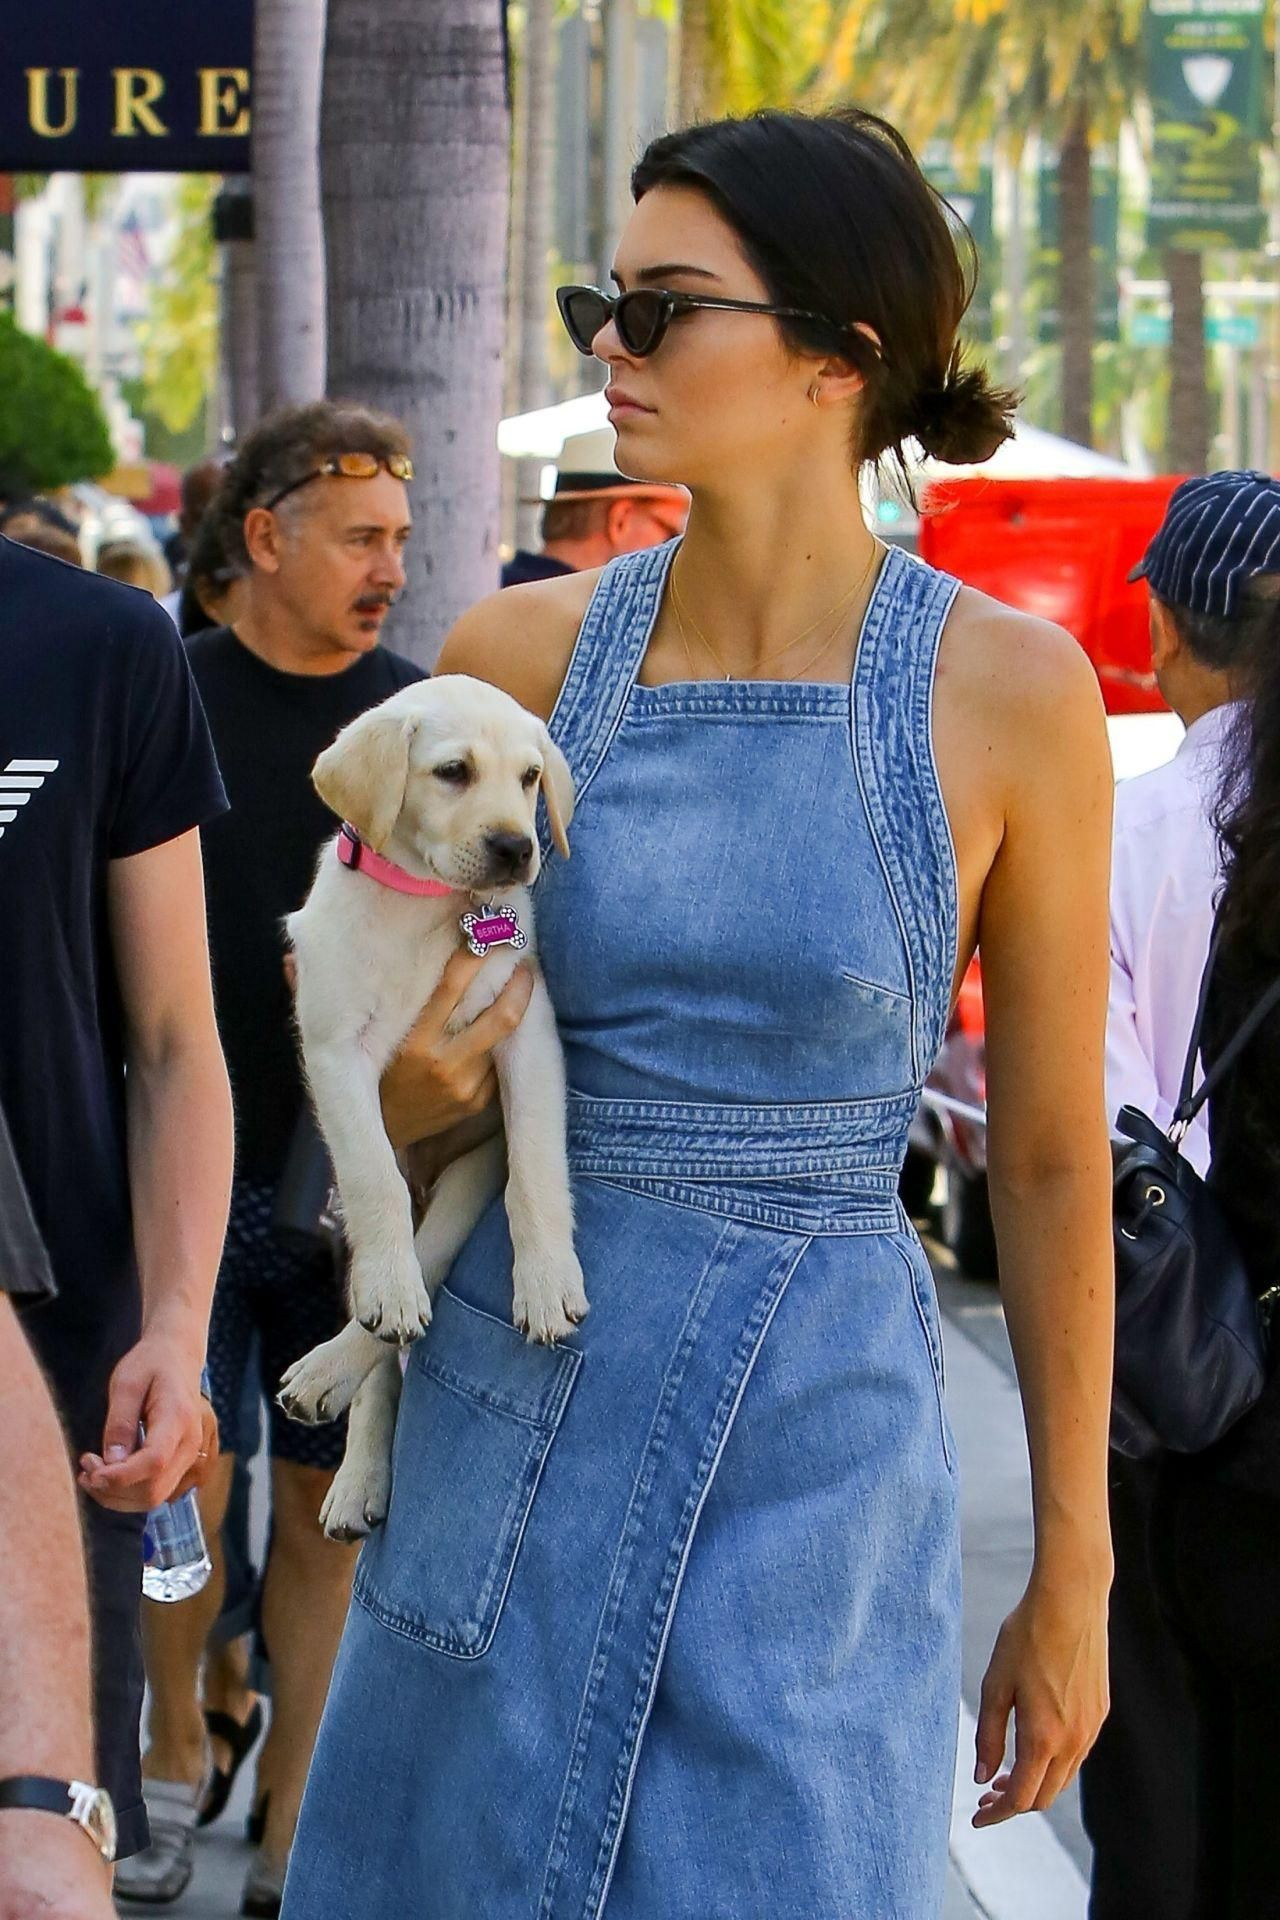 Kendall Jenner Walking With Her Cute Dog Bertha In A Denim Dress By Stella Mccartney